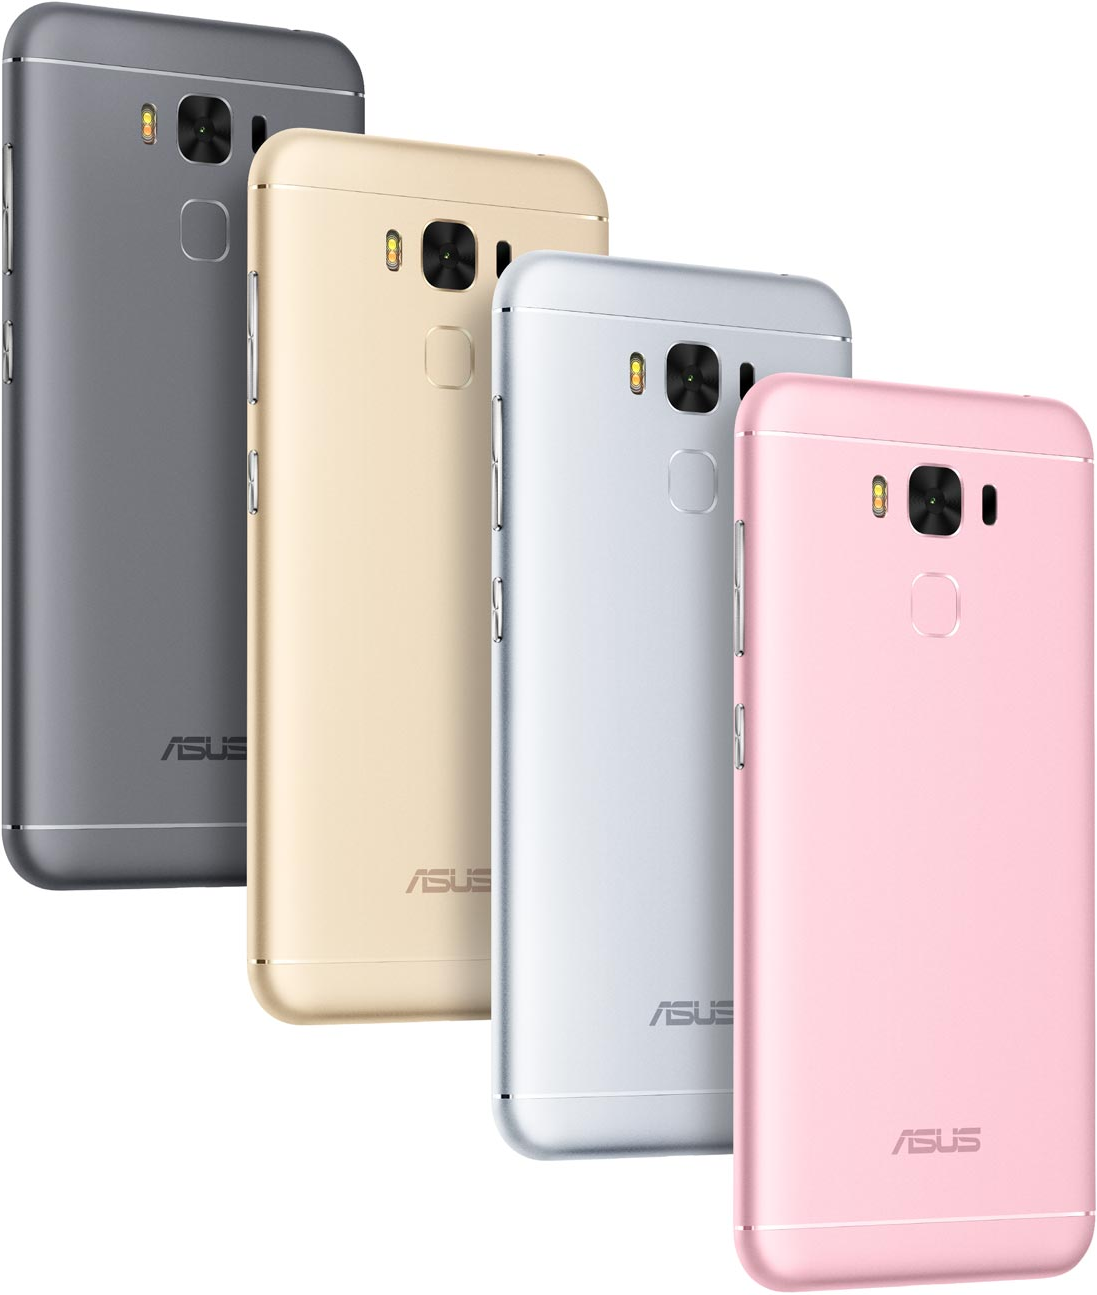 Mobilní telefon mobil smartphone Asus ZenFone 3 Max ZC553KL Grey